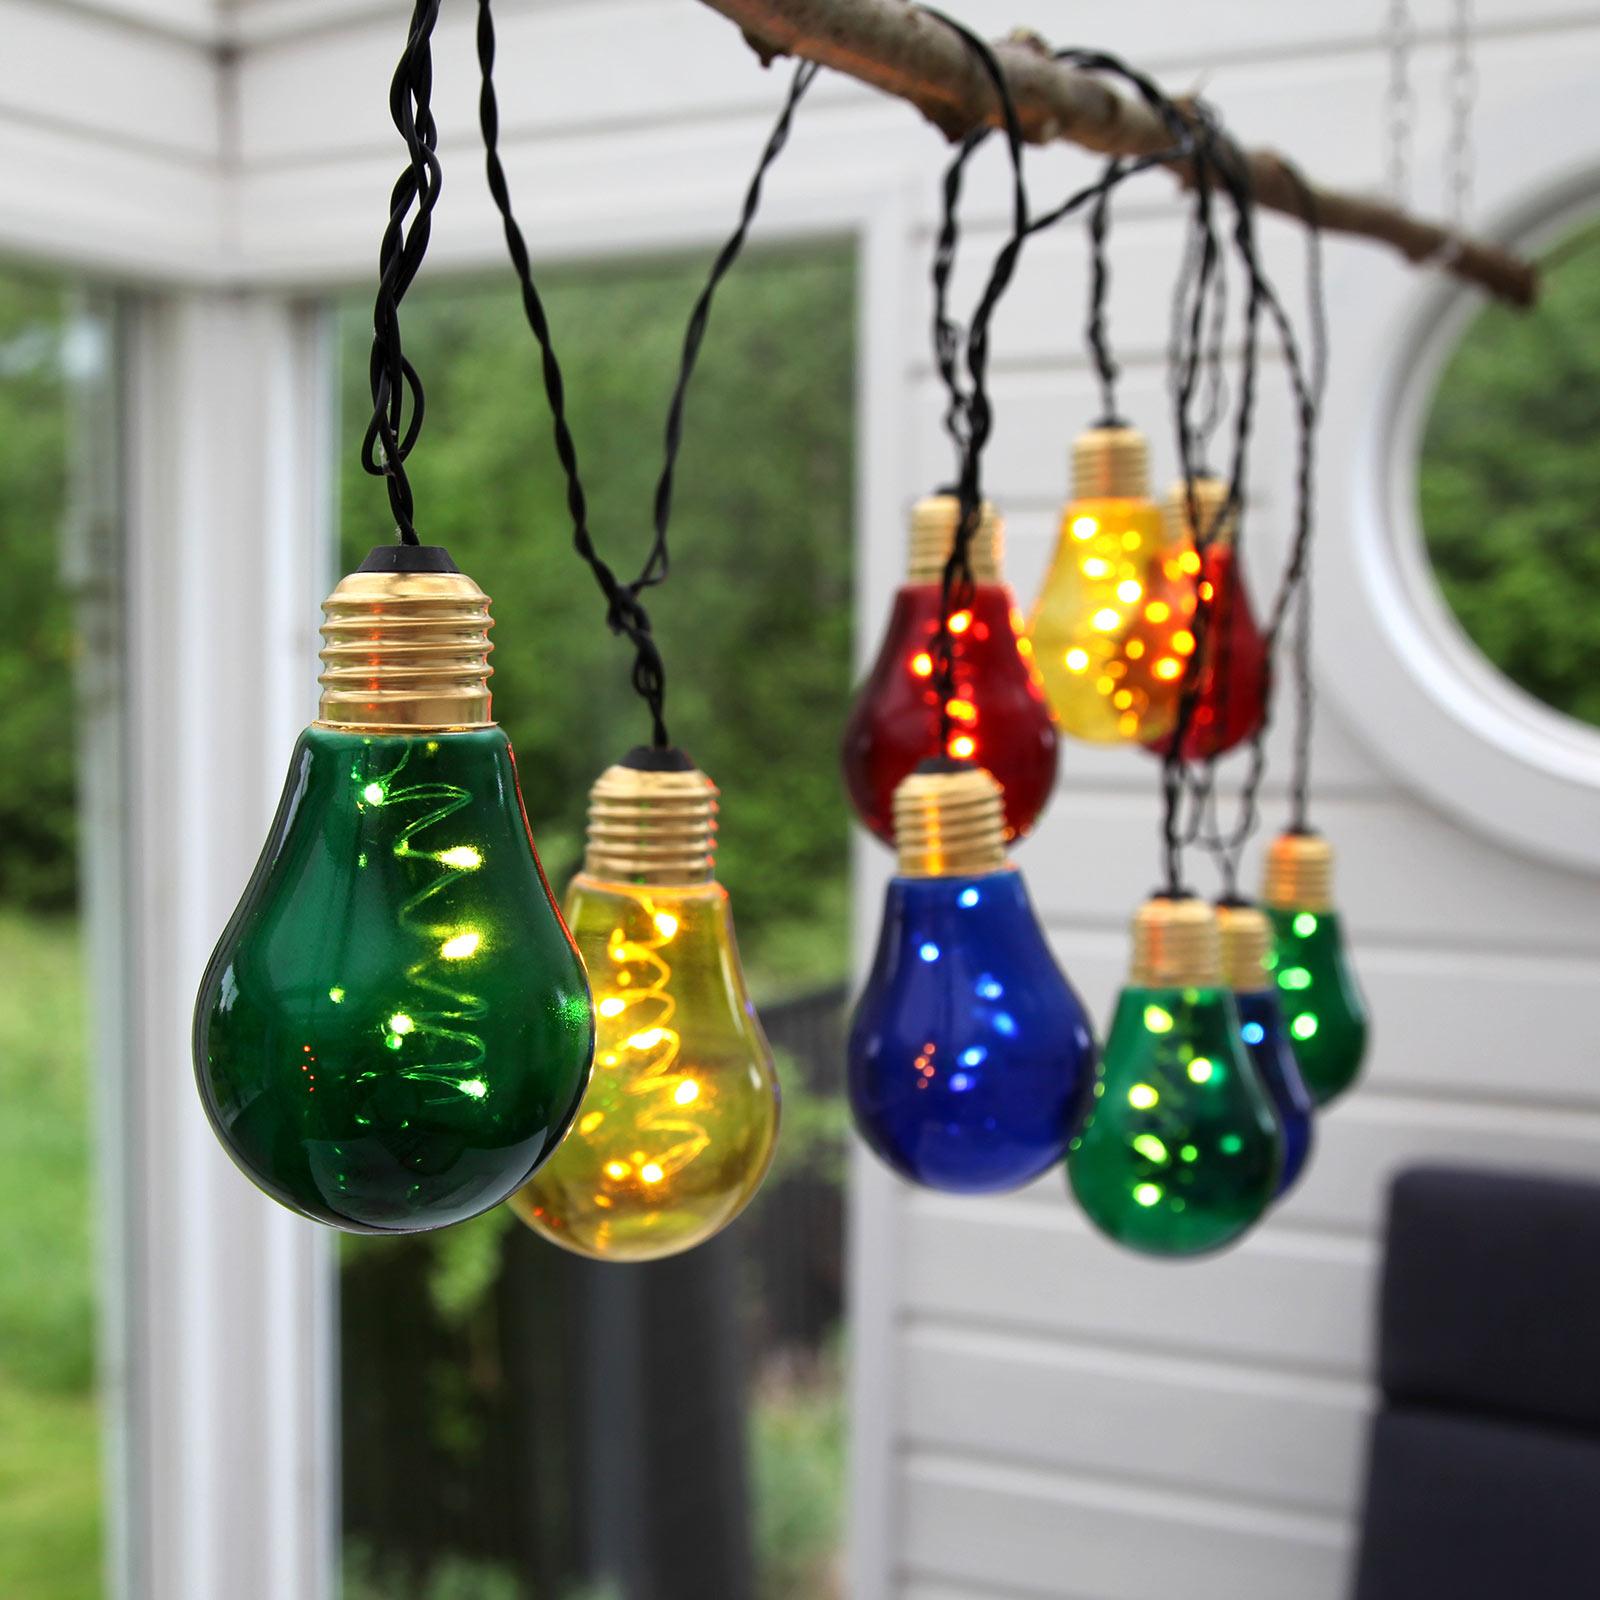 LED lichtketting Glow met 10 bonte lichtbronnen